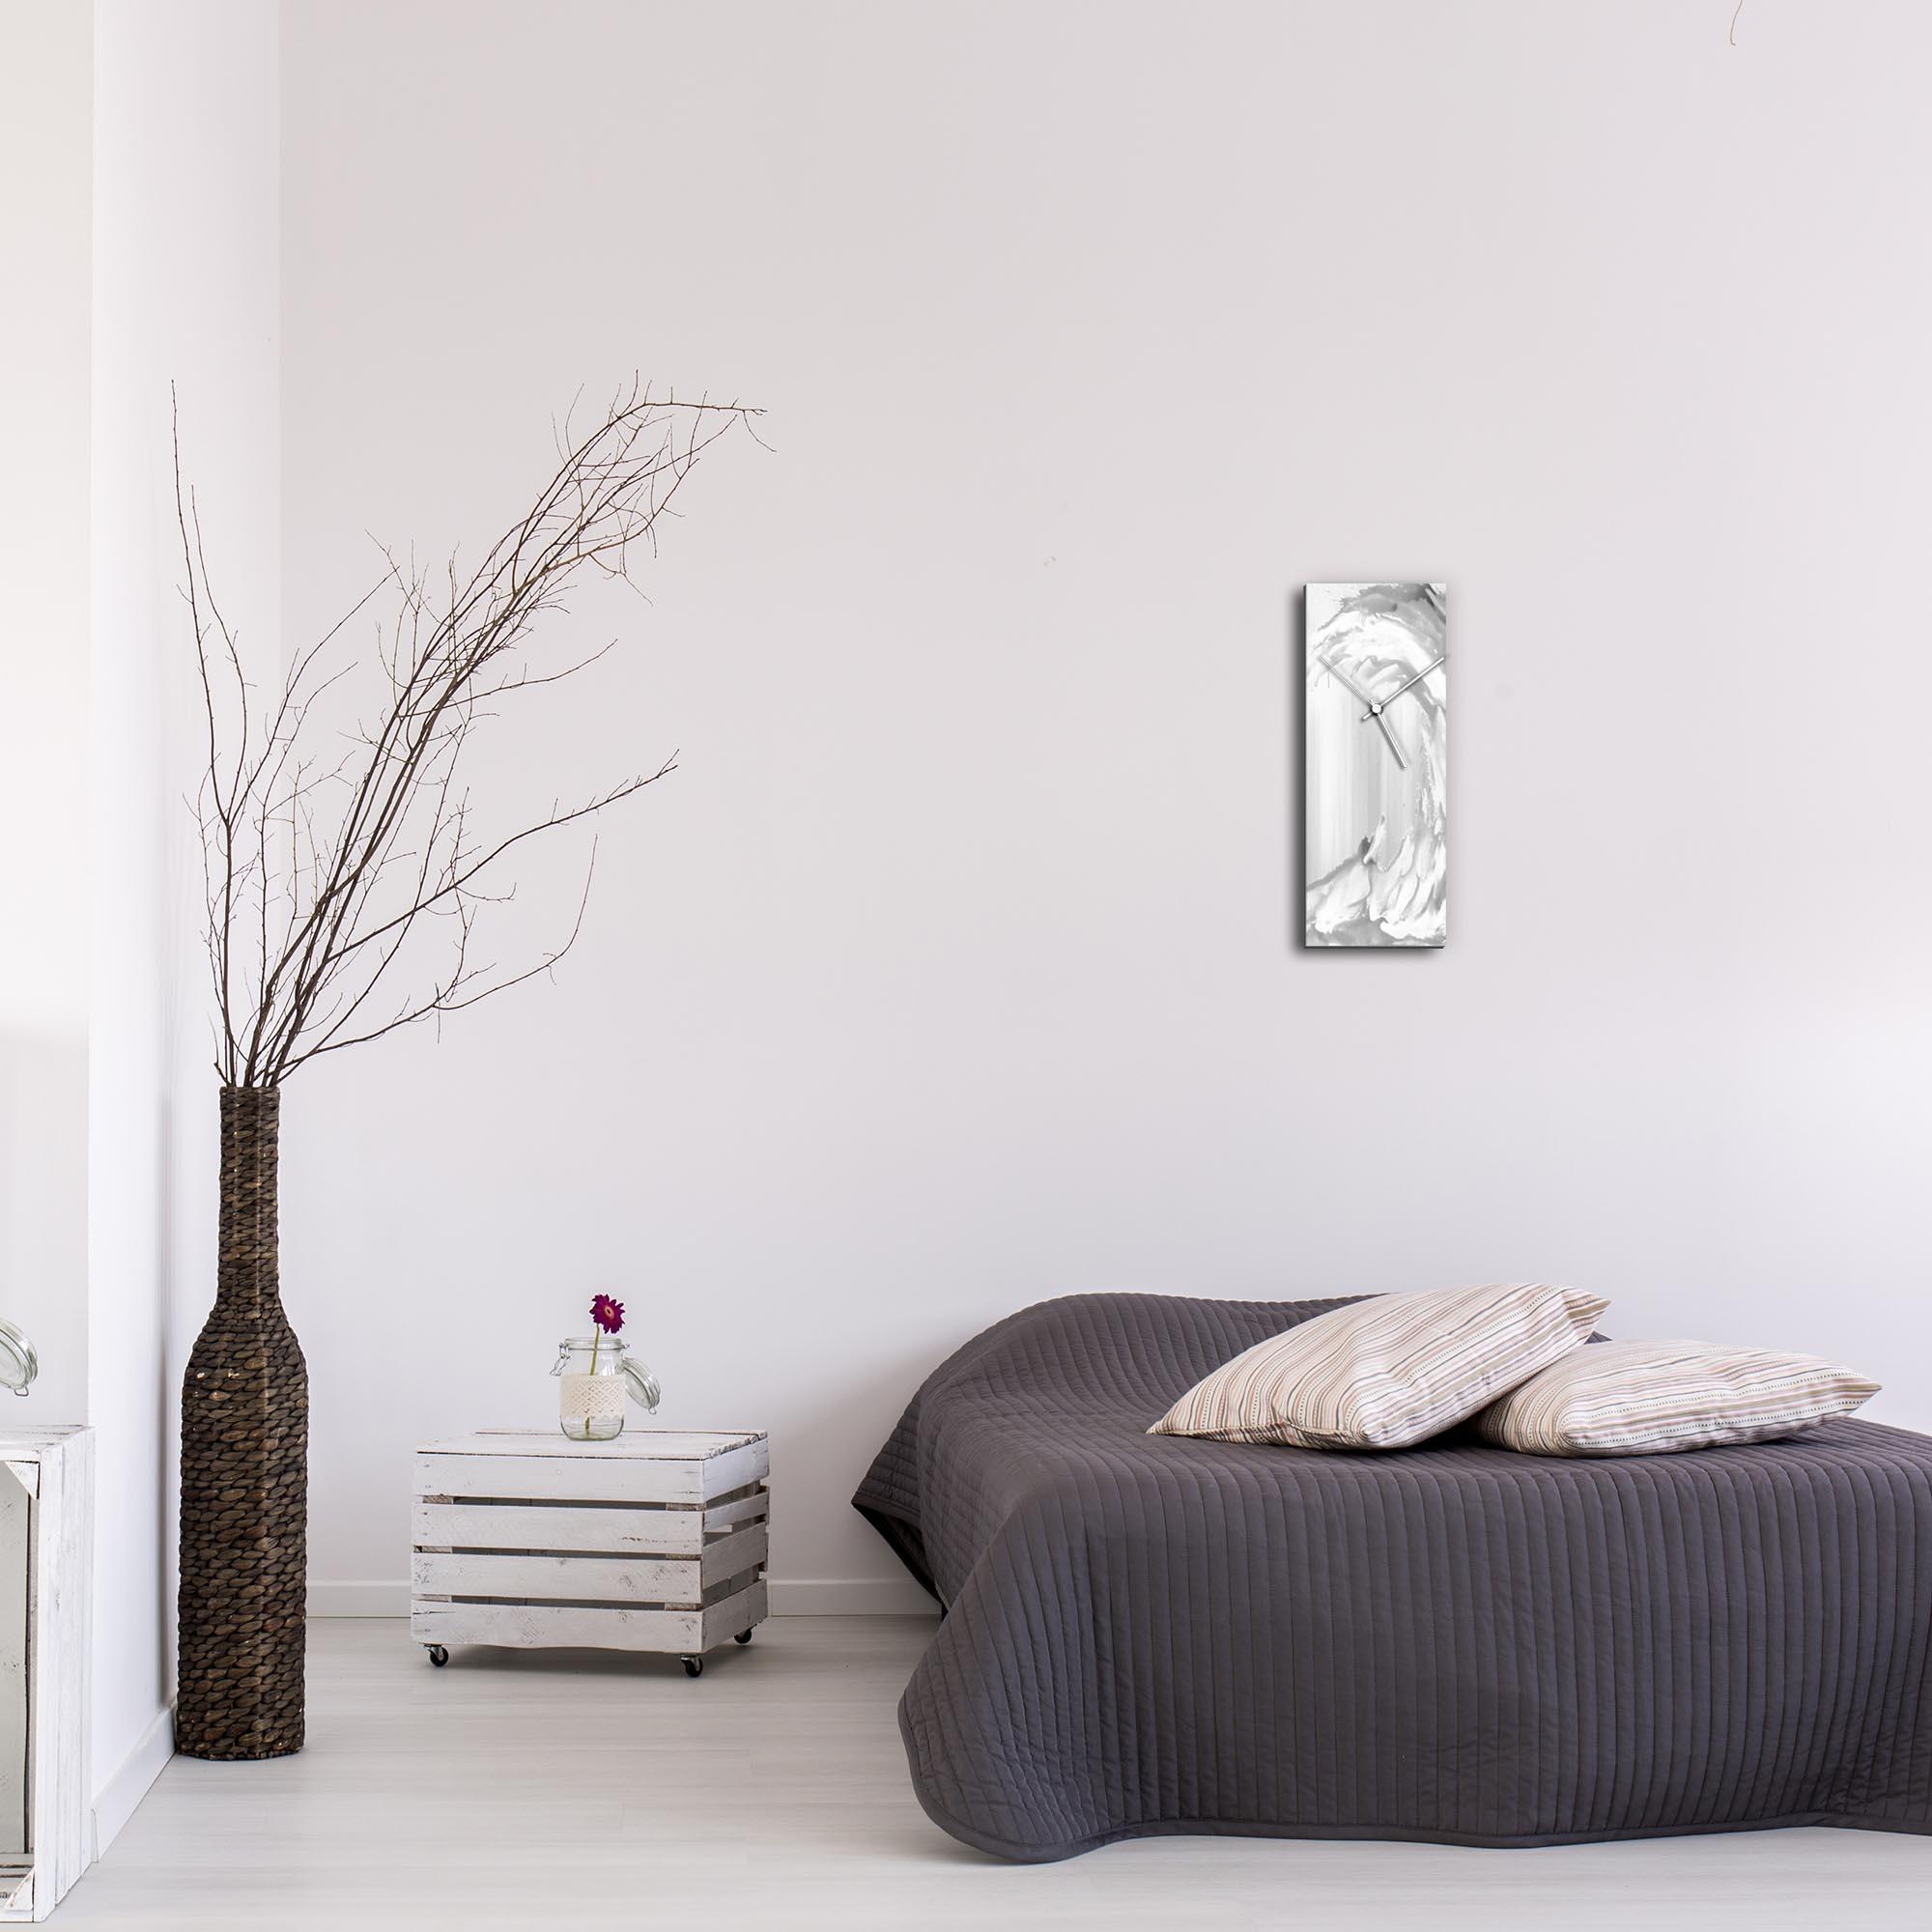 White Wave v2 Clock by Mendo Vasilevski - Urban Abstract Home Decor - Lifestyle View